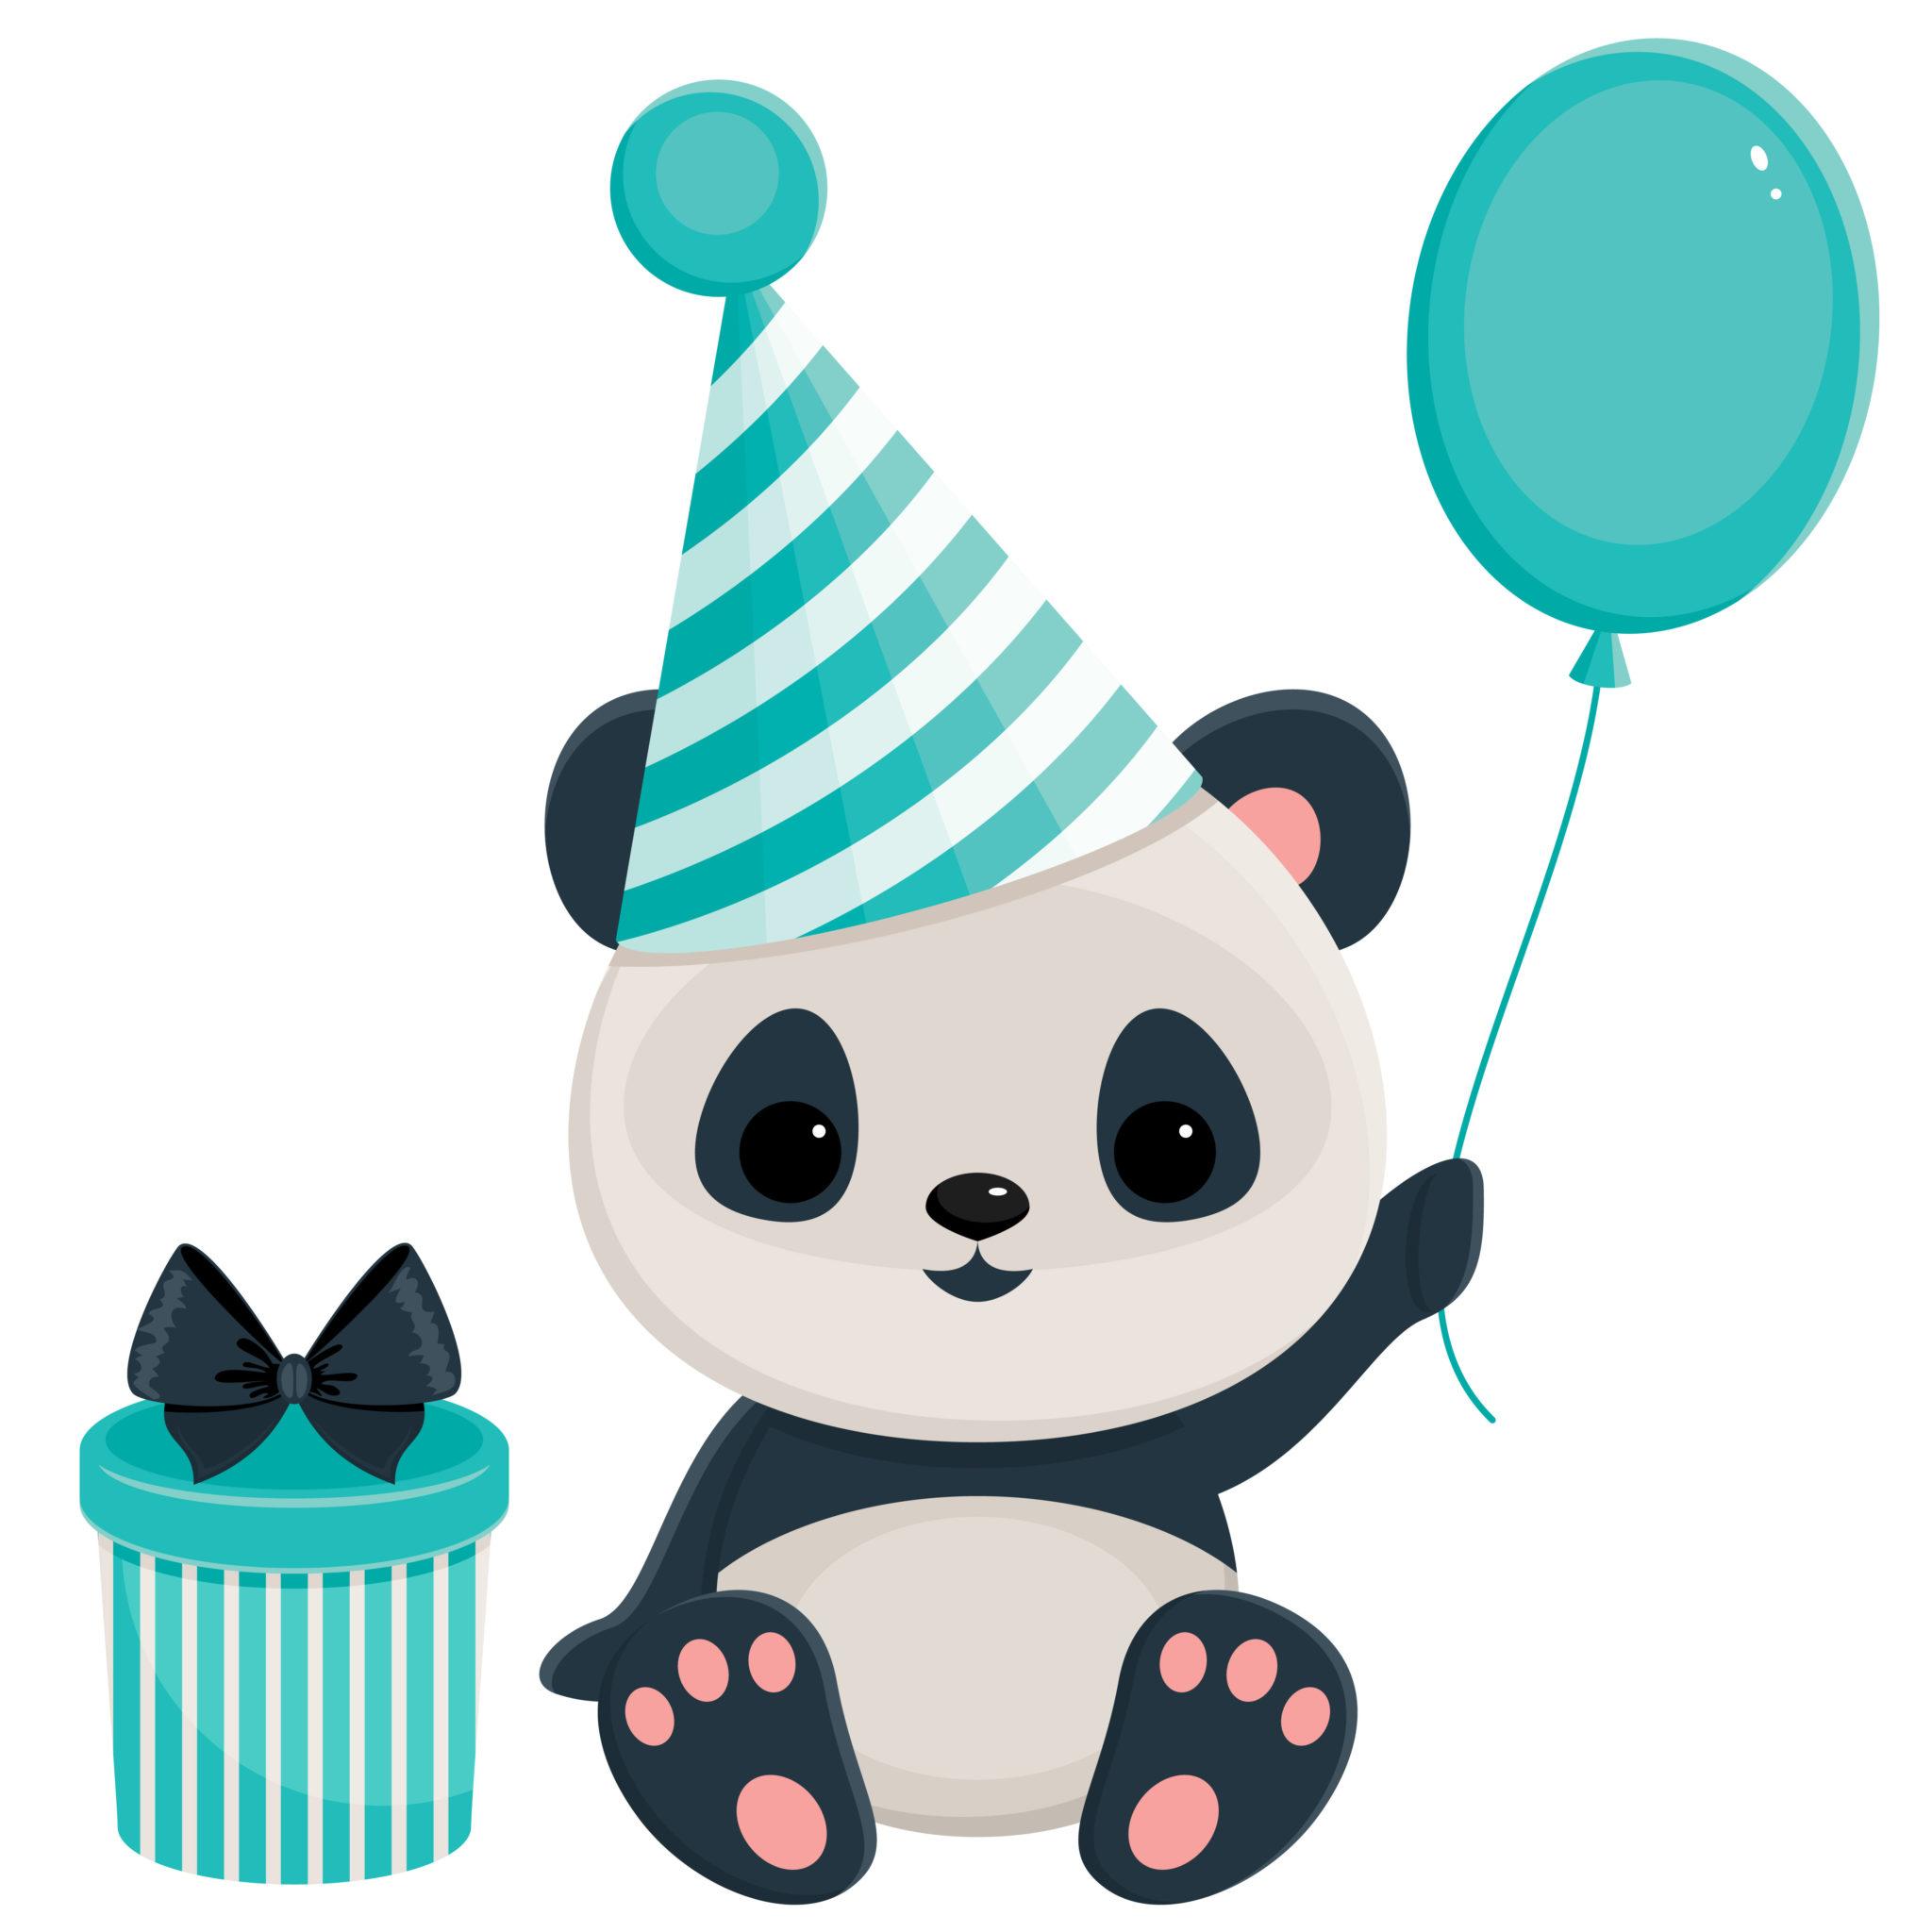 Panda Birthday Clipart - Clipart Kid